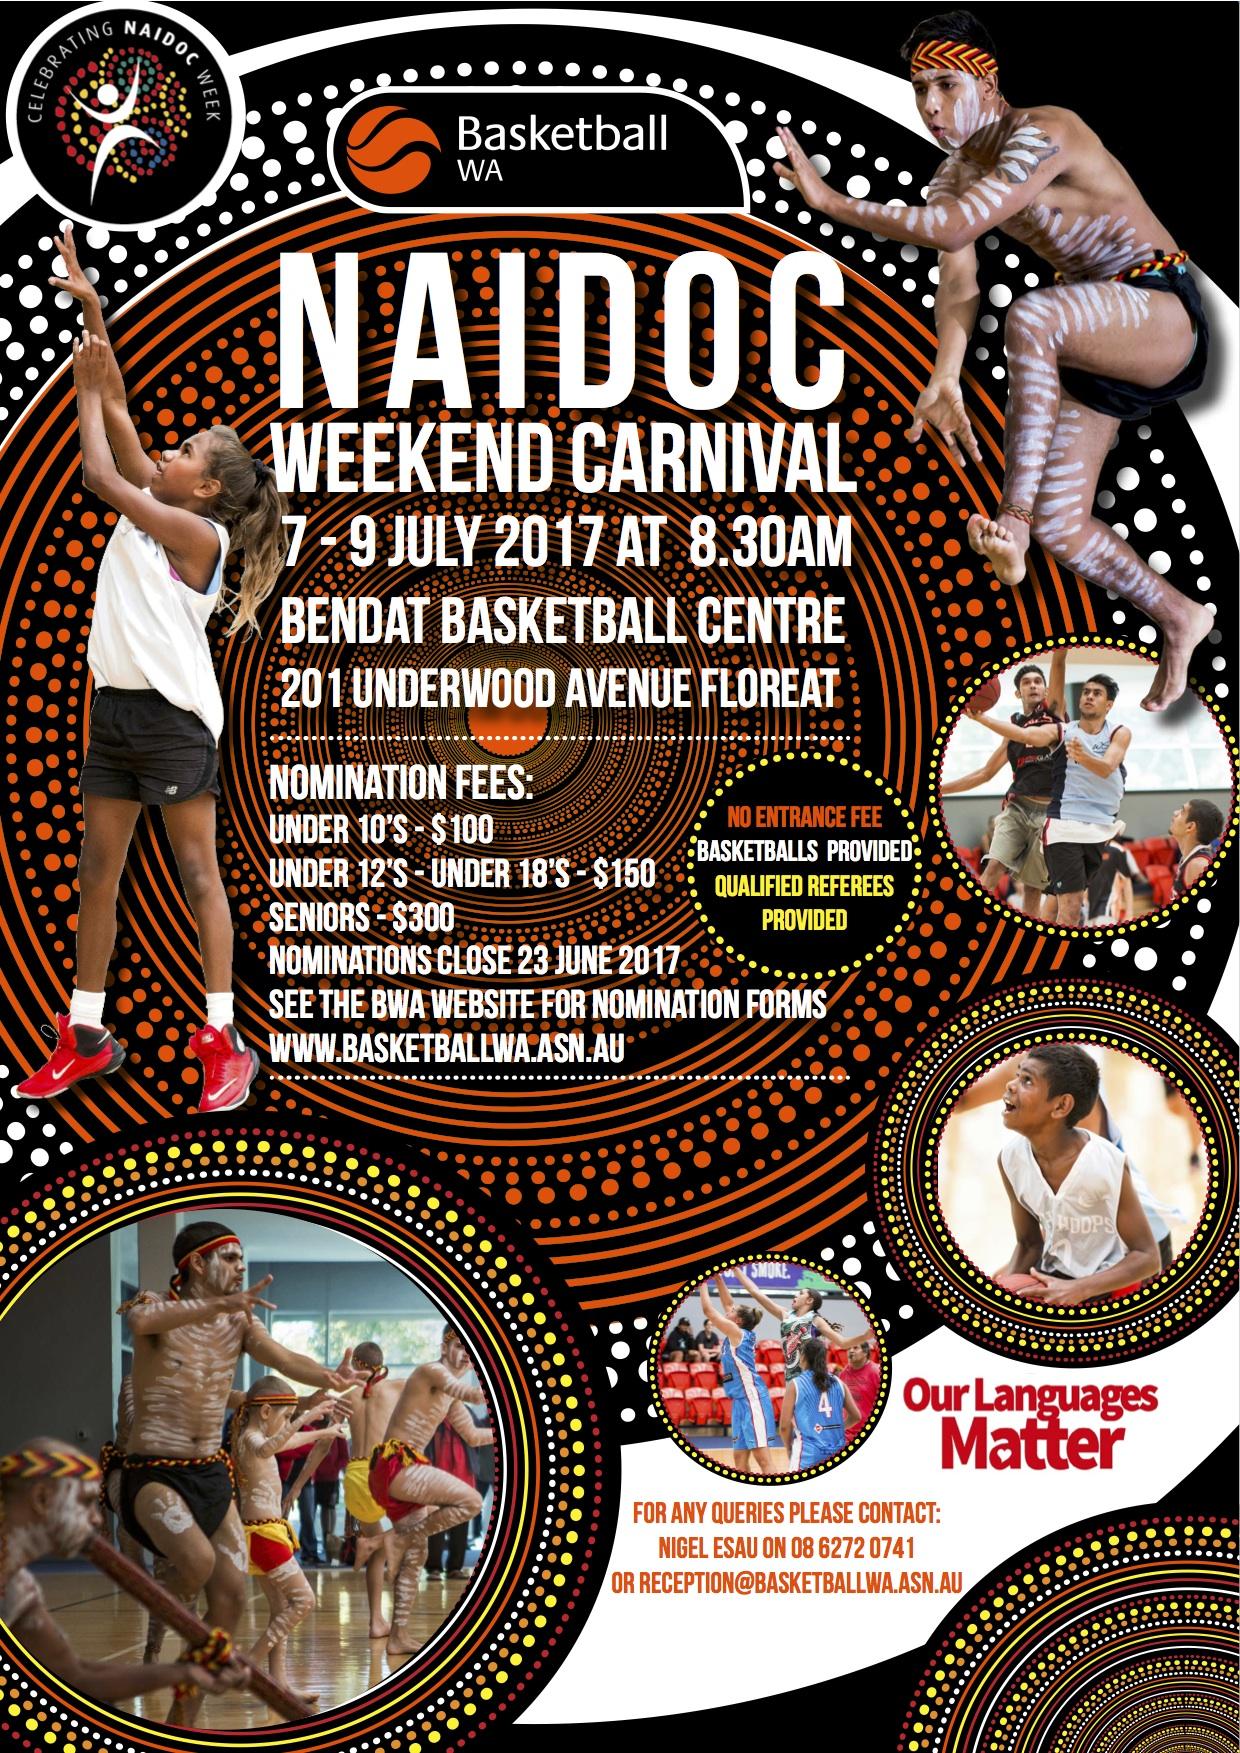 NAIDOC BWA Carnival Flyer 2017 copy.jpg